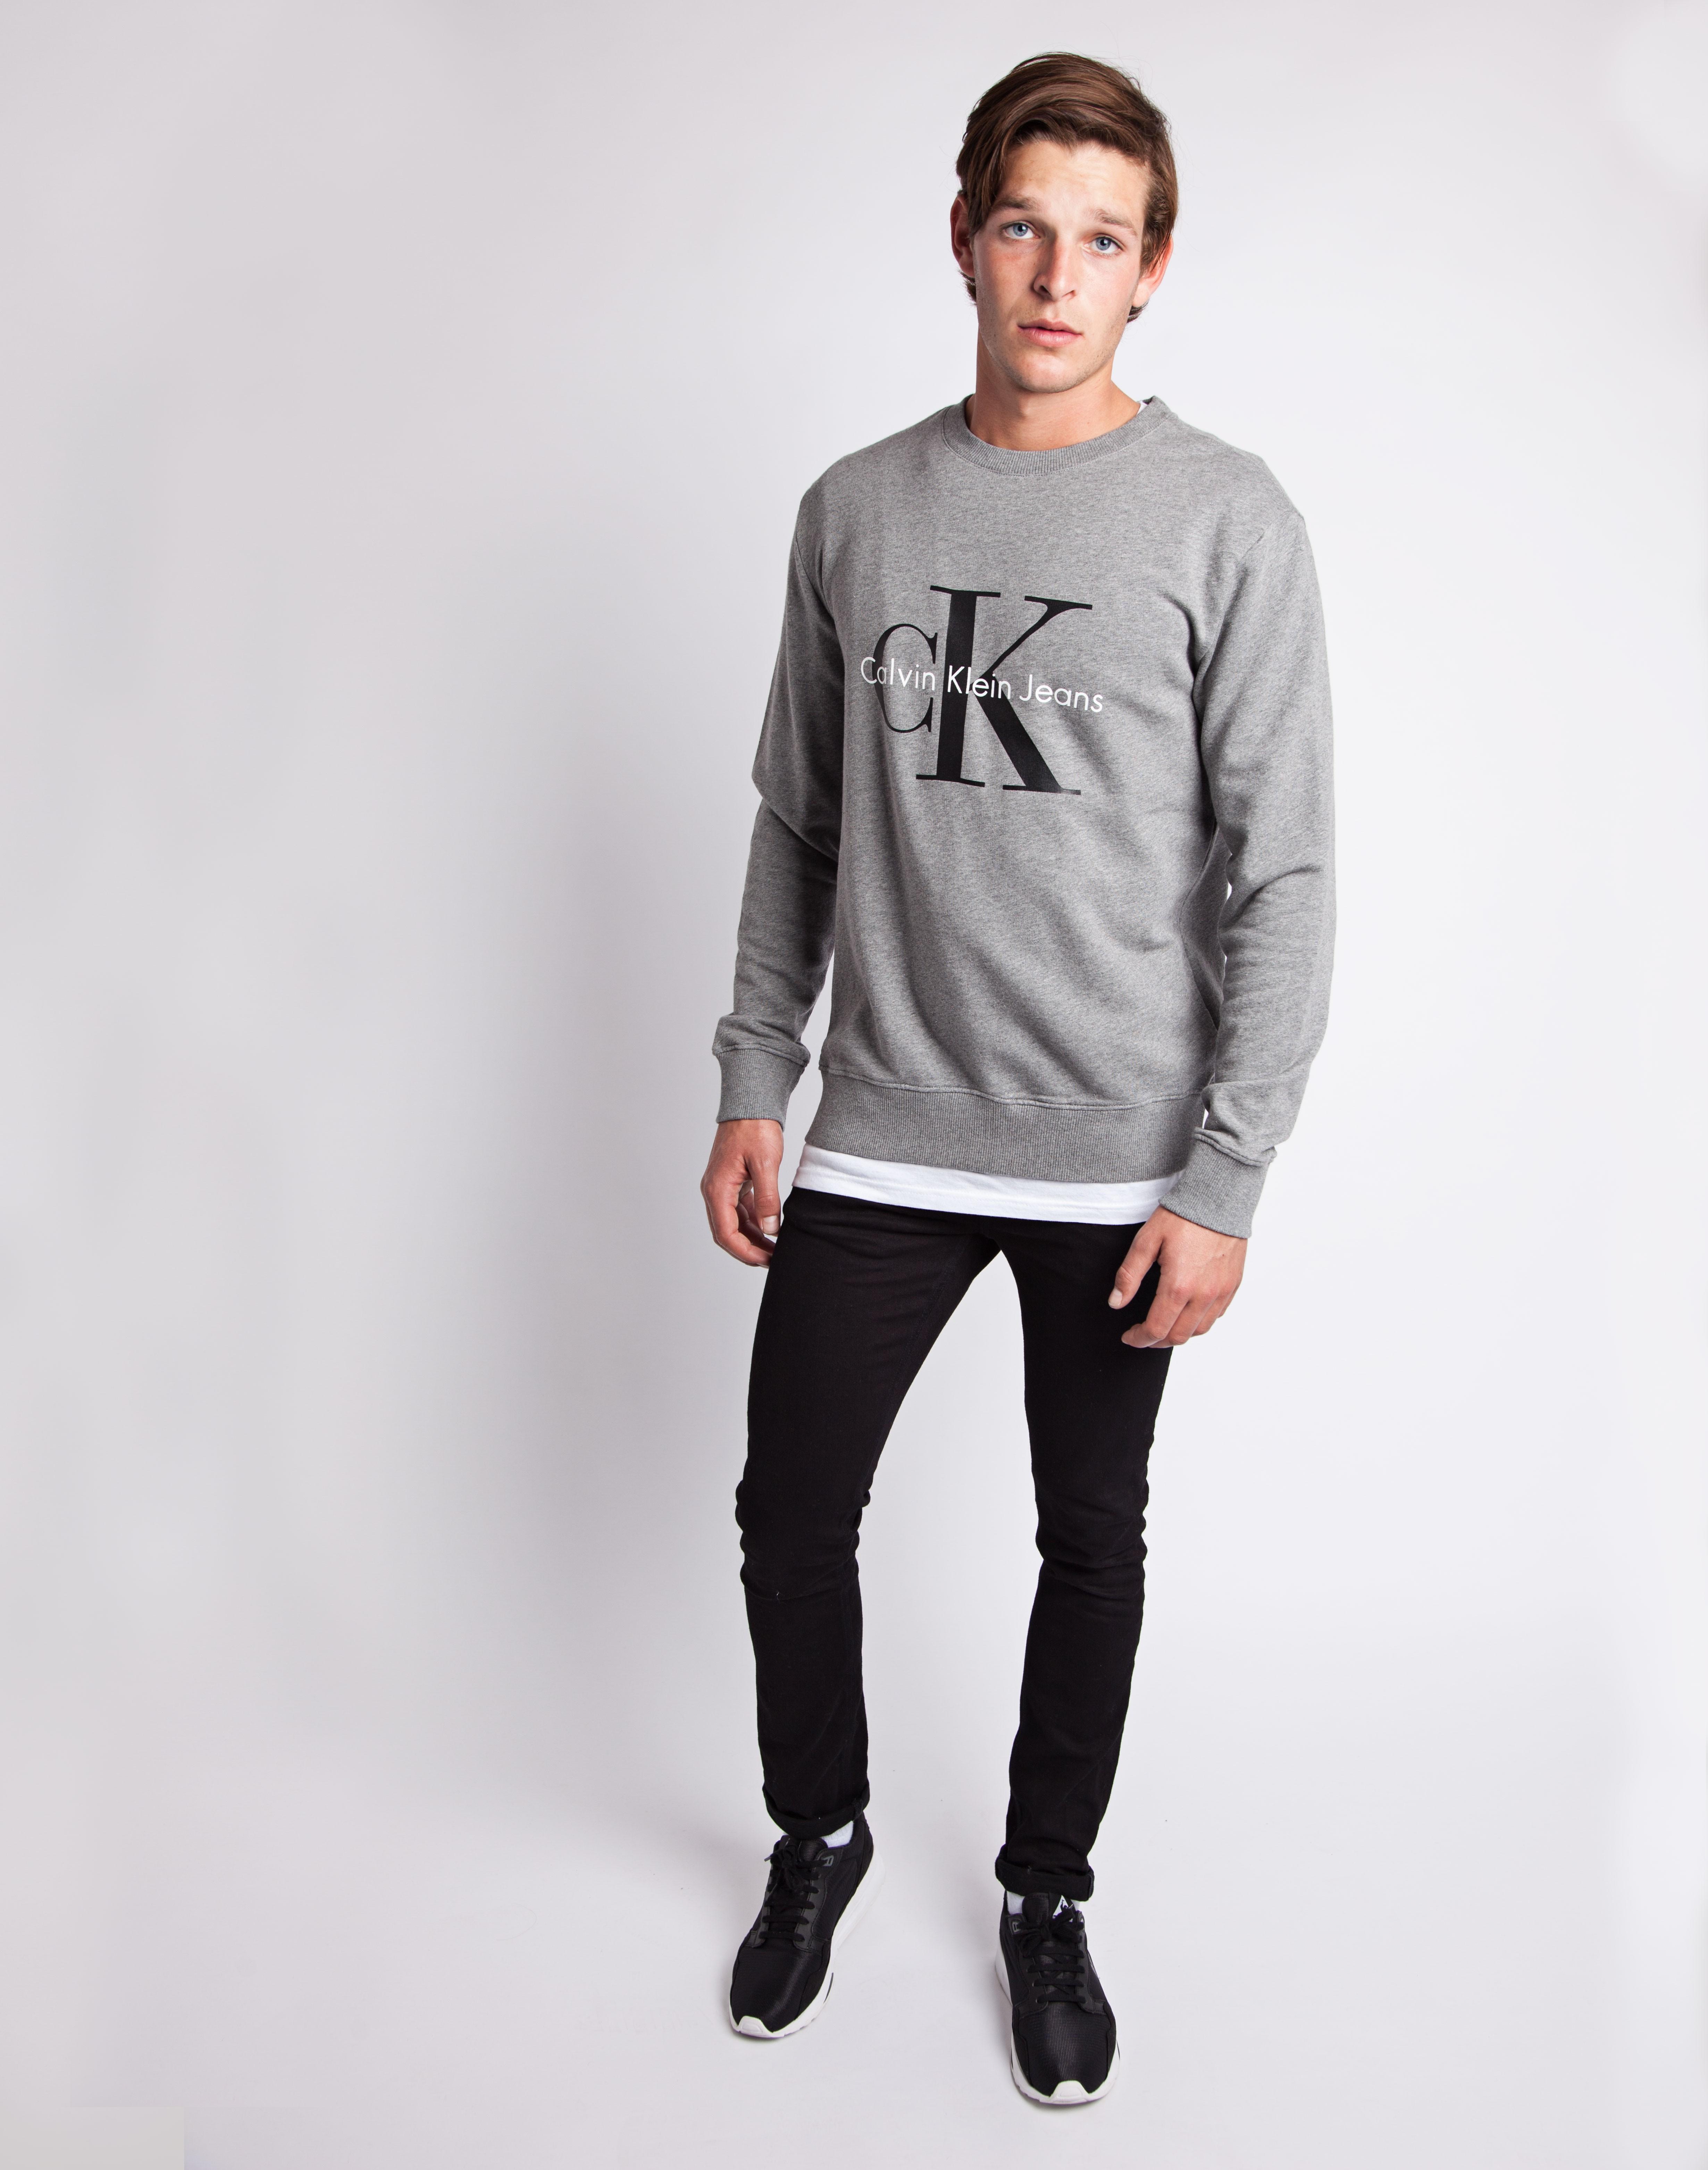 Lyst Calvin Klein Jeans Classic Sweatshirt Grey In Gray For Men